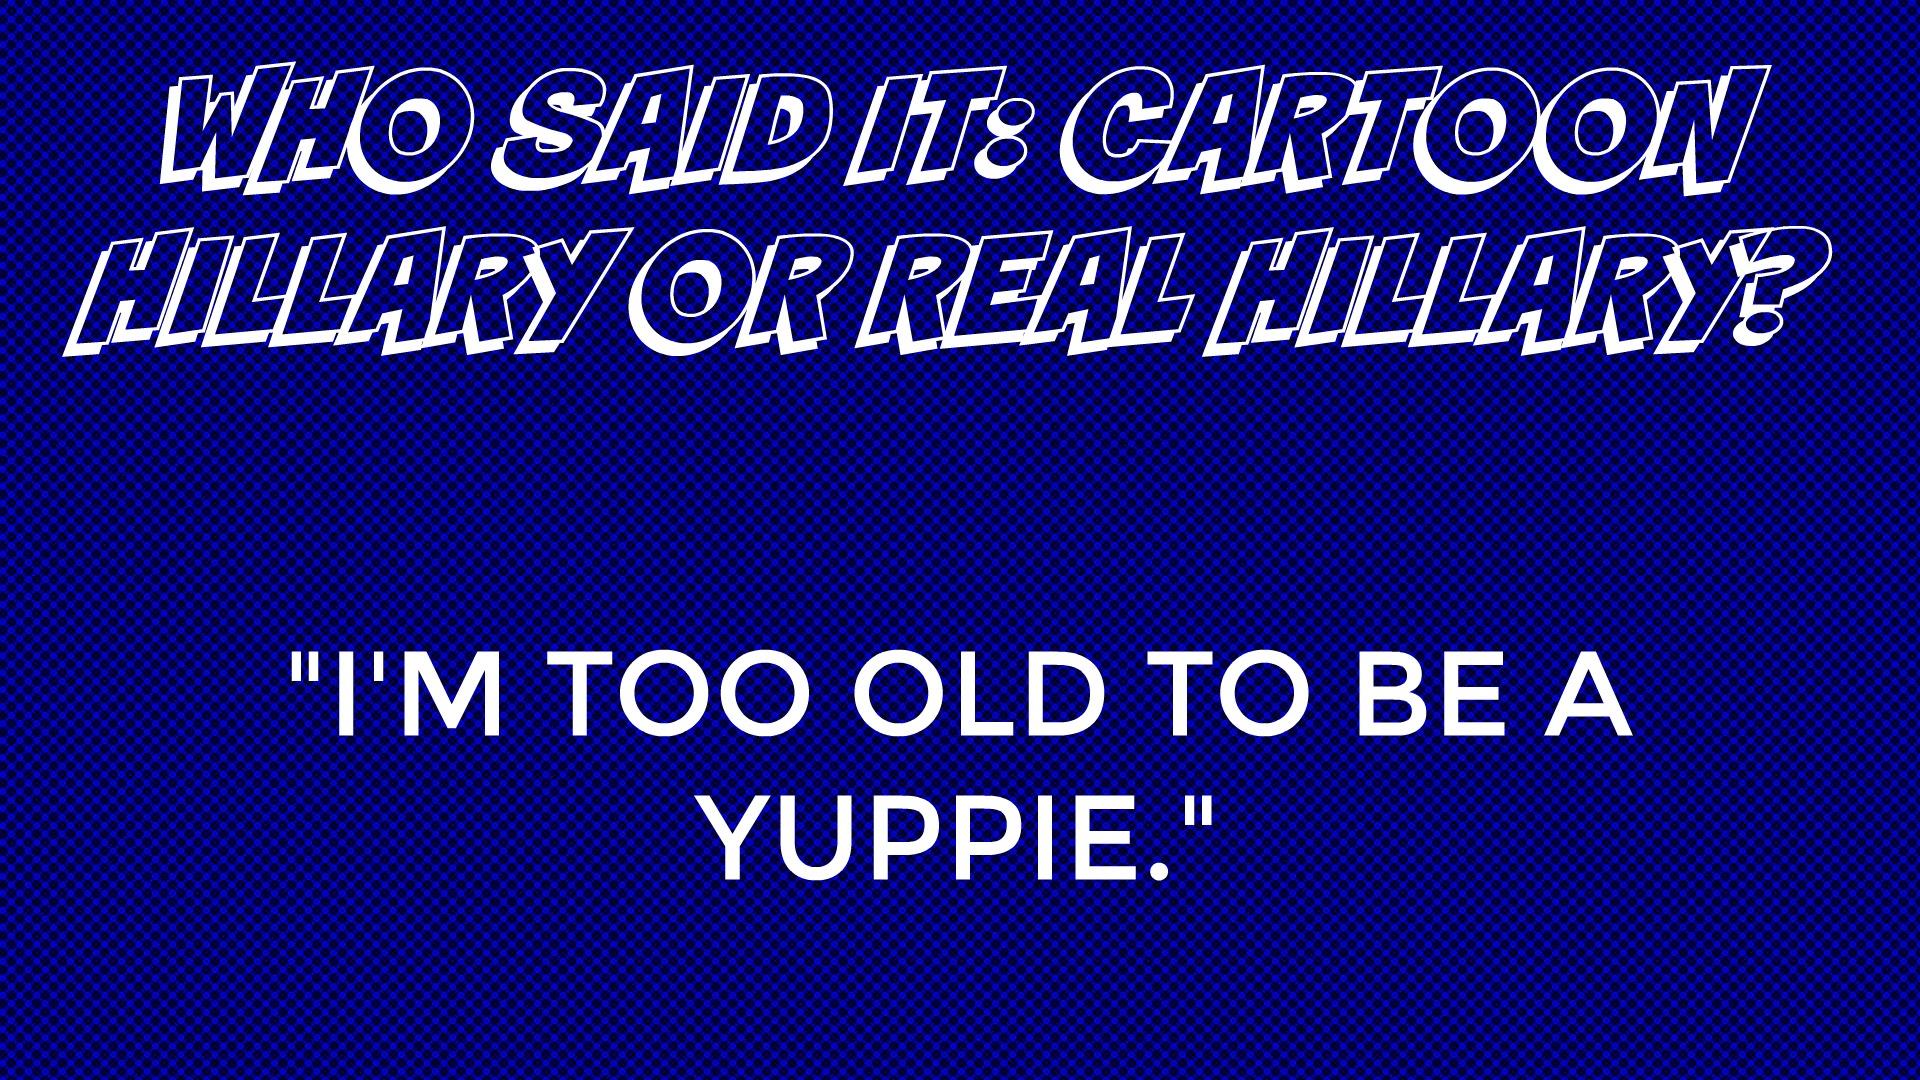 Who said it: Cartoon Hillary or Real Hillary?